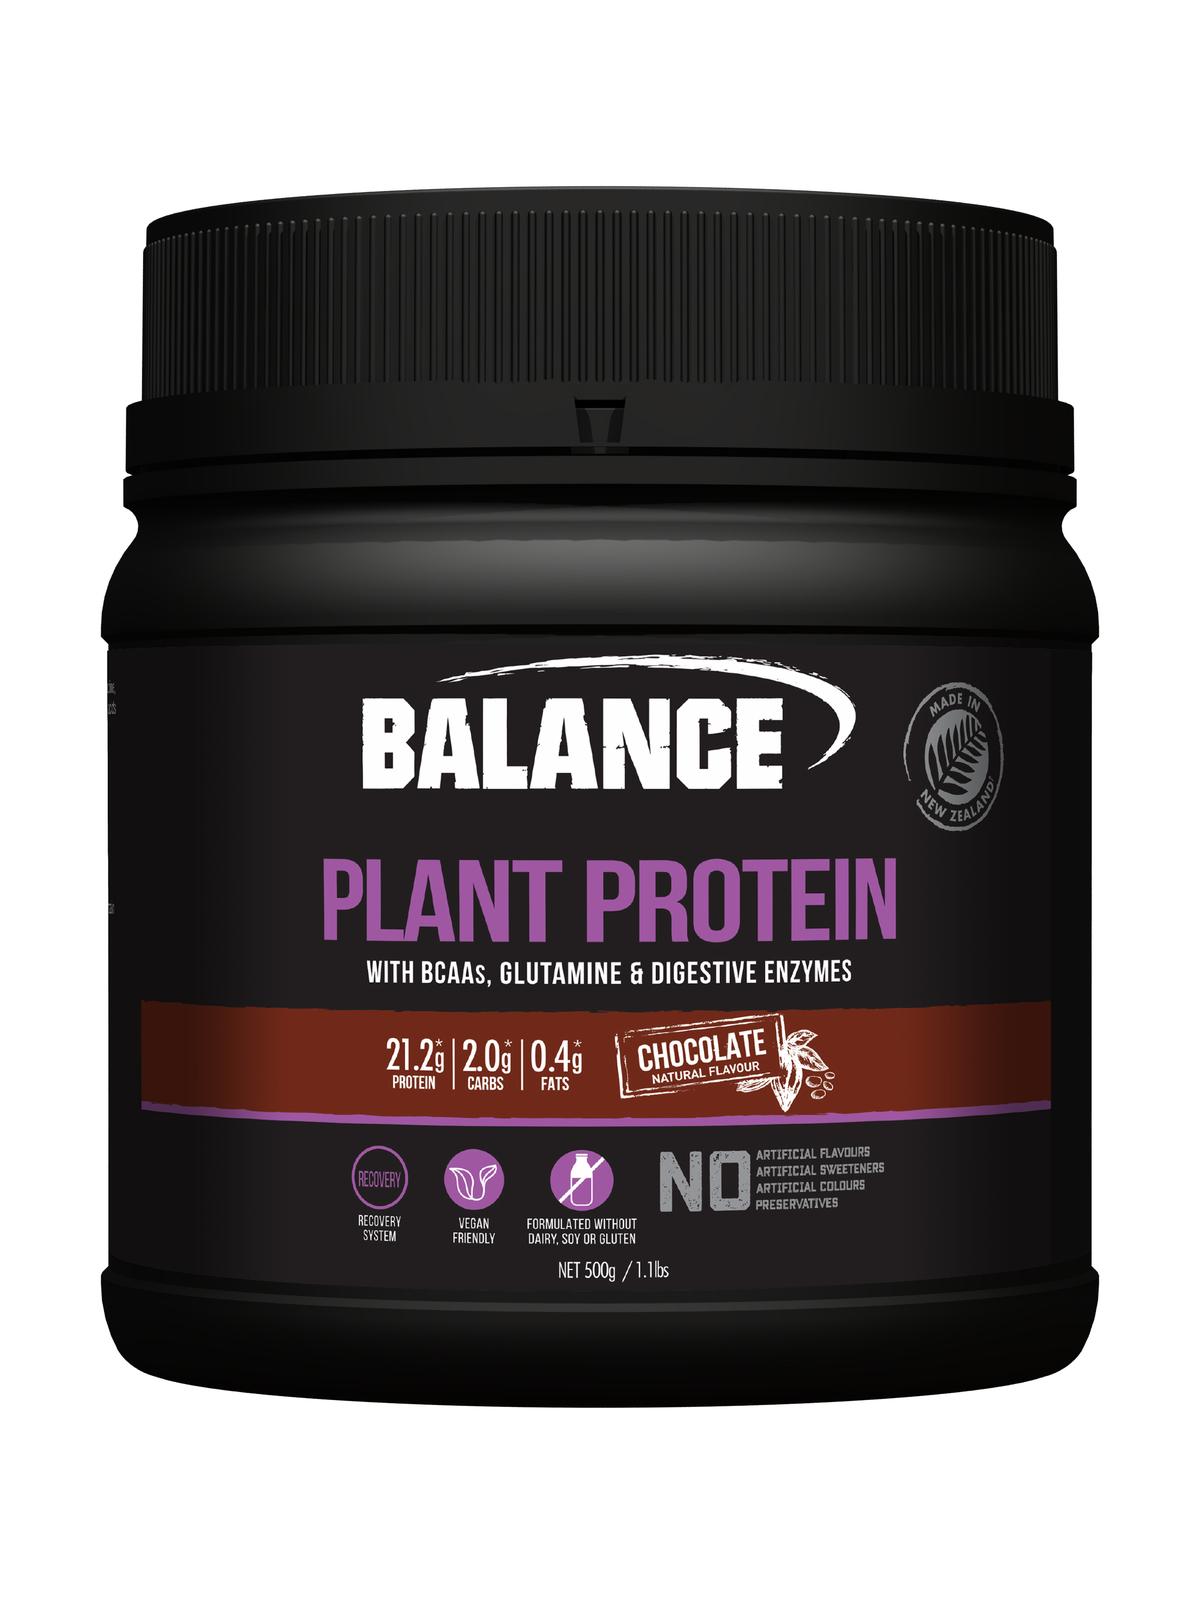 Balance Plant Protein - Chocolate (500g) image